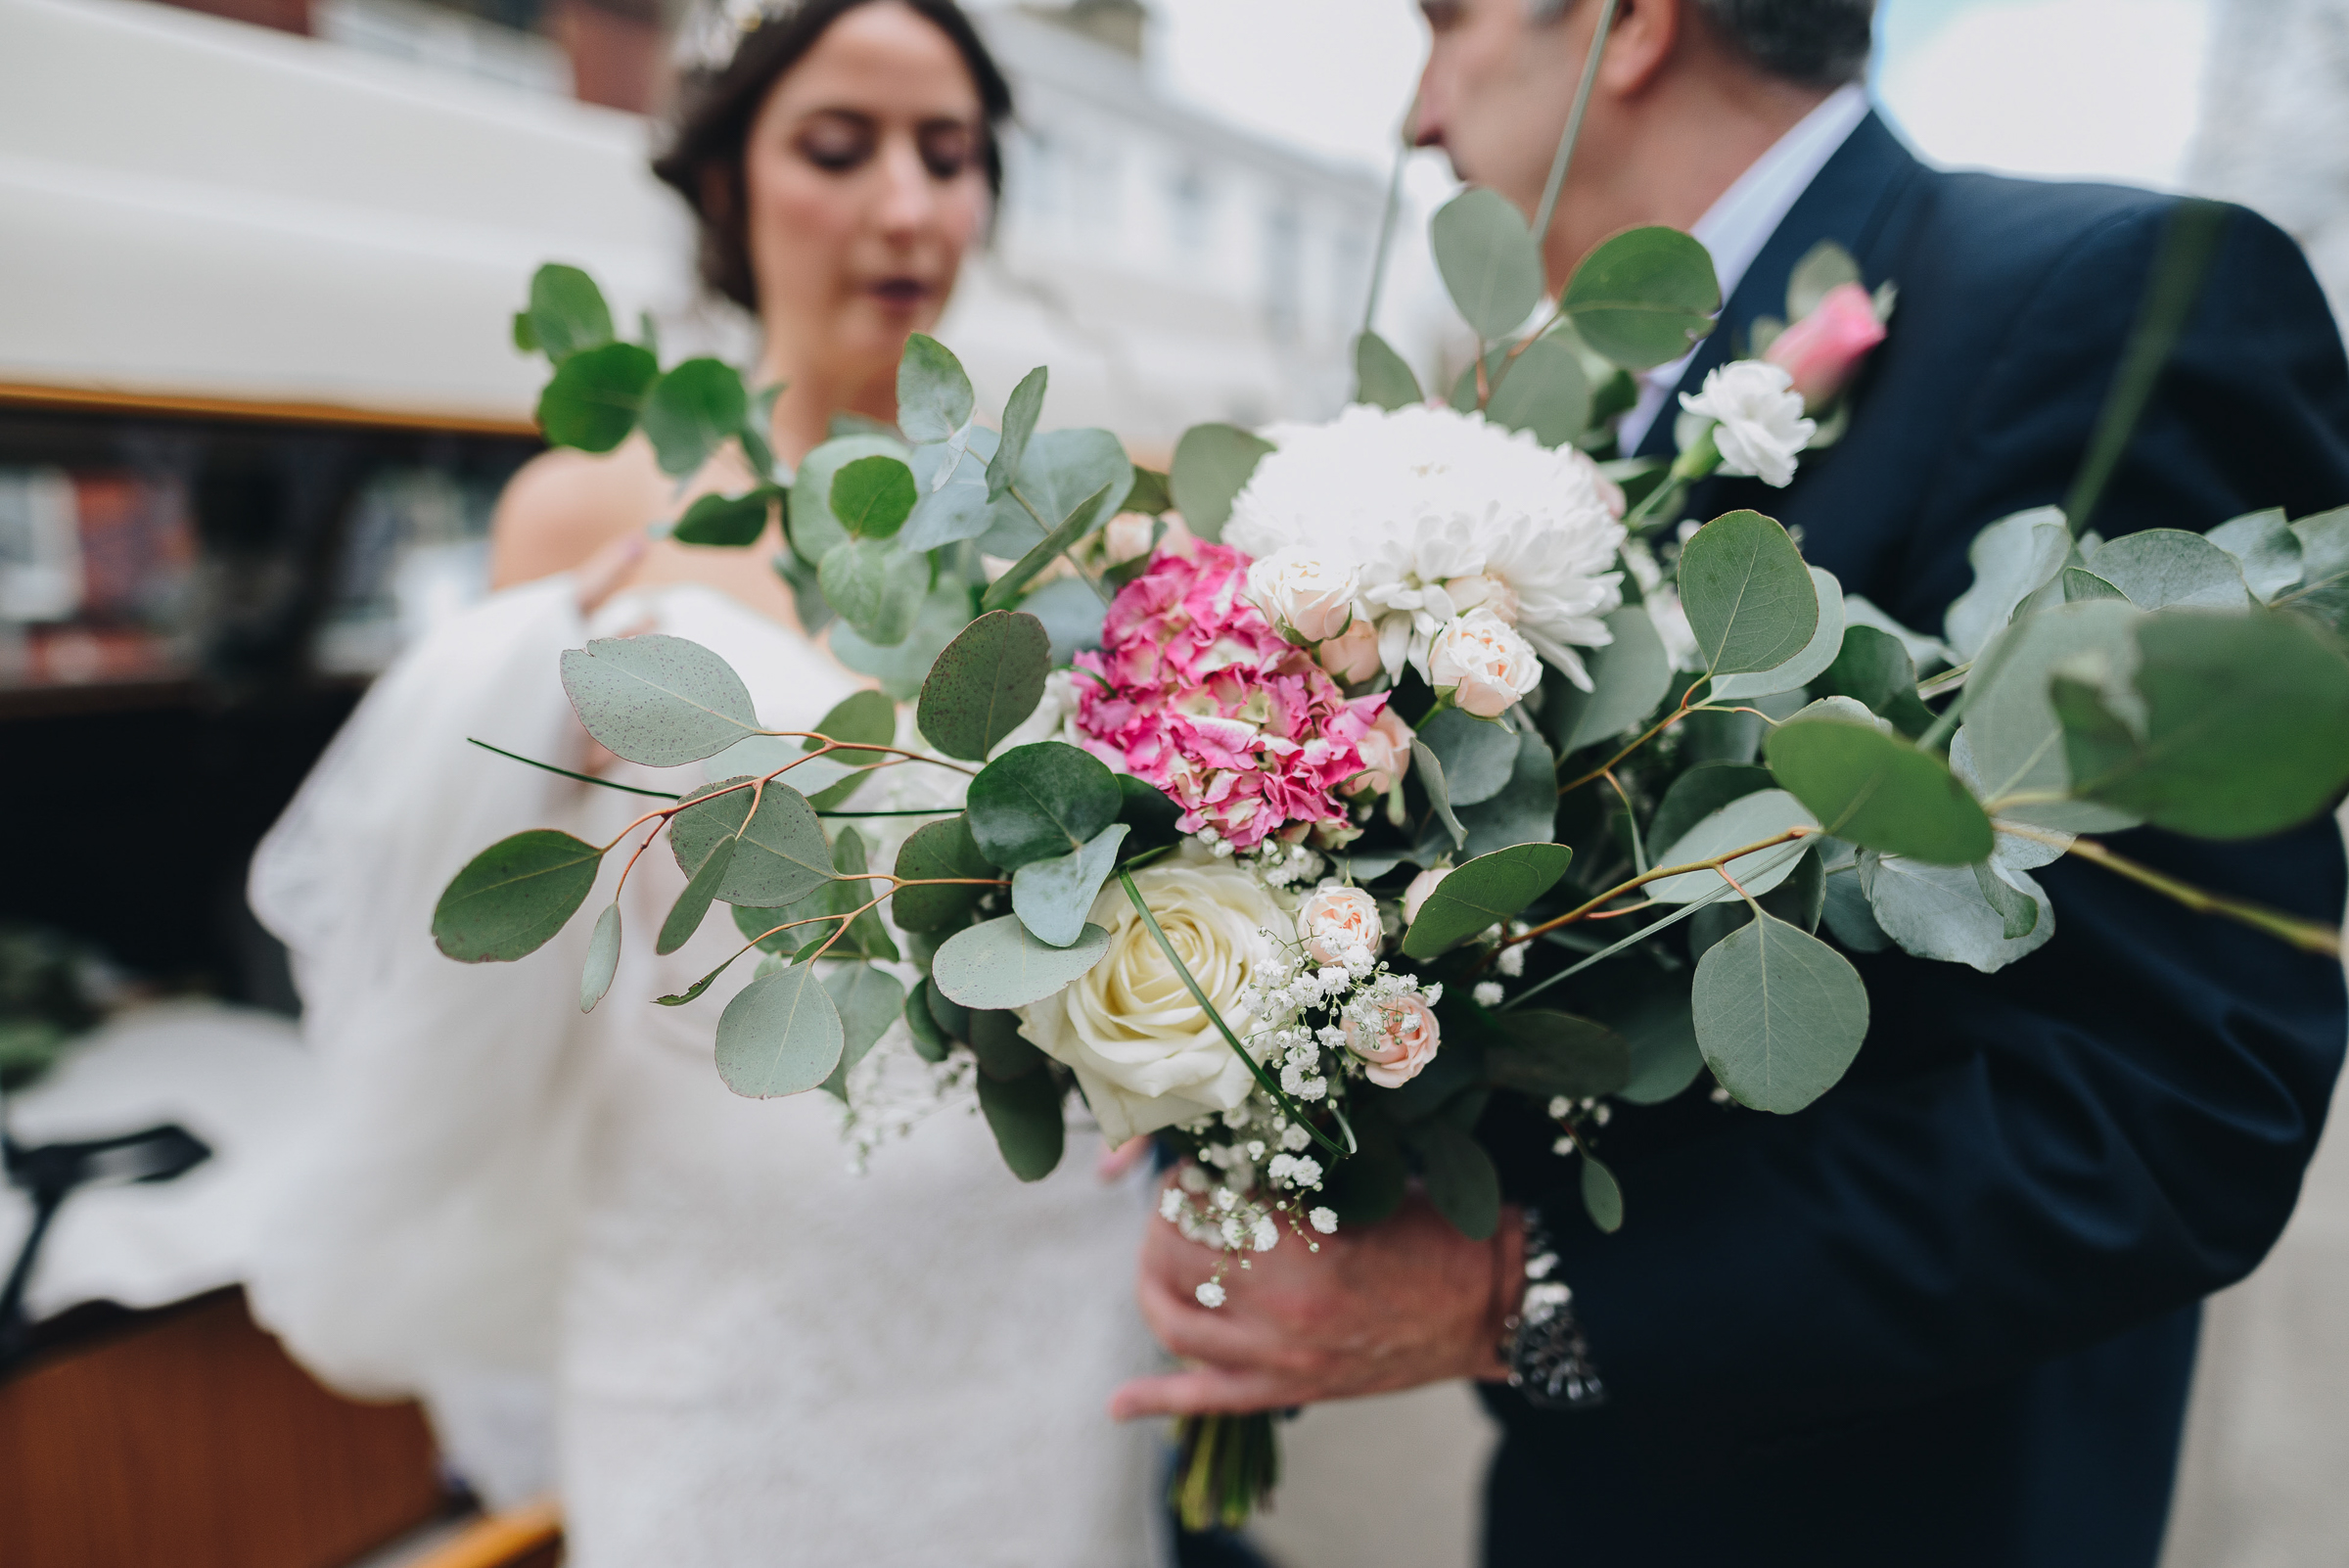 Rochdale-town-hall-vegan-harry-potter-wedding-photography-12.jpg